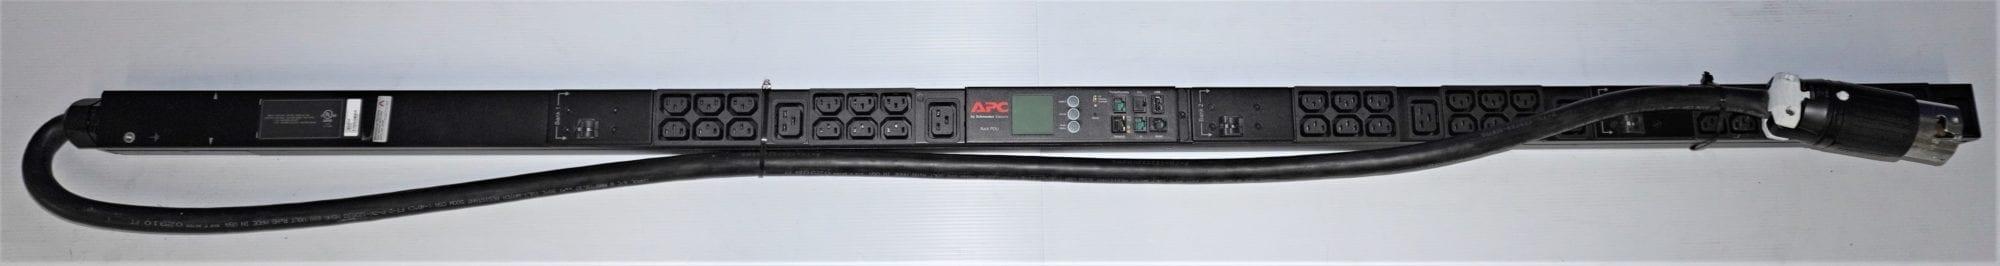 apc ap8868 rack pdu 2g metered zerou 10 0kw 208v 36 c13 6 c19